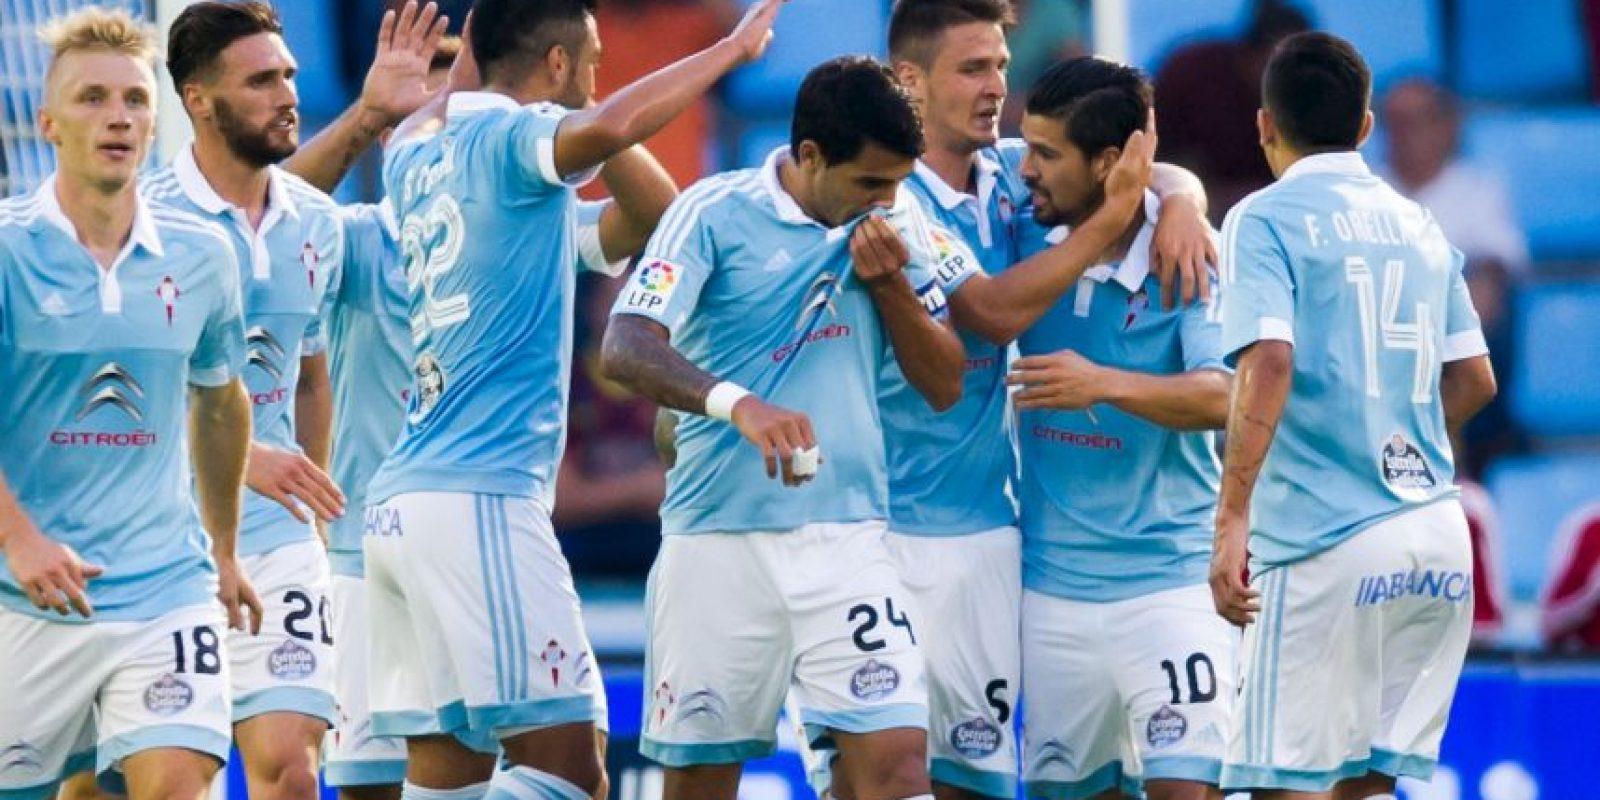 LIGA BBVA: Celta de Vigo (2) vs. Real Madrid (1) en Balaídos Foto:Getty Images